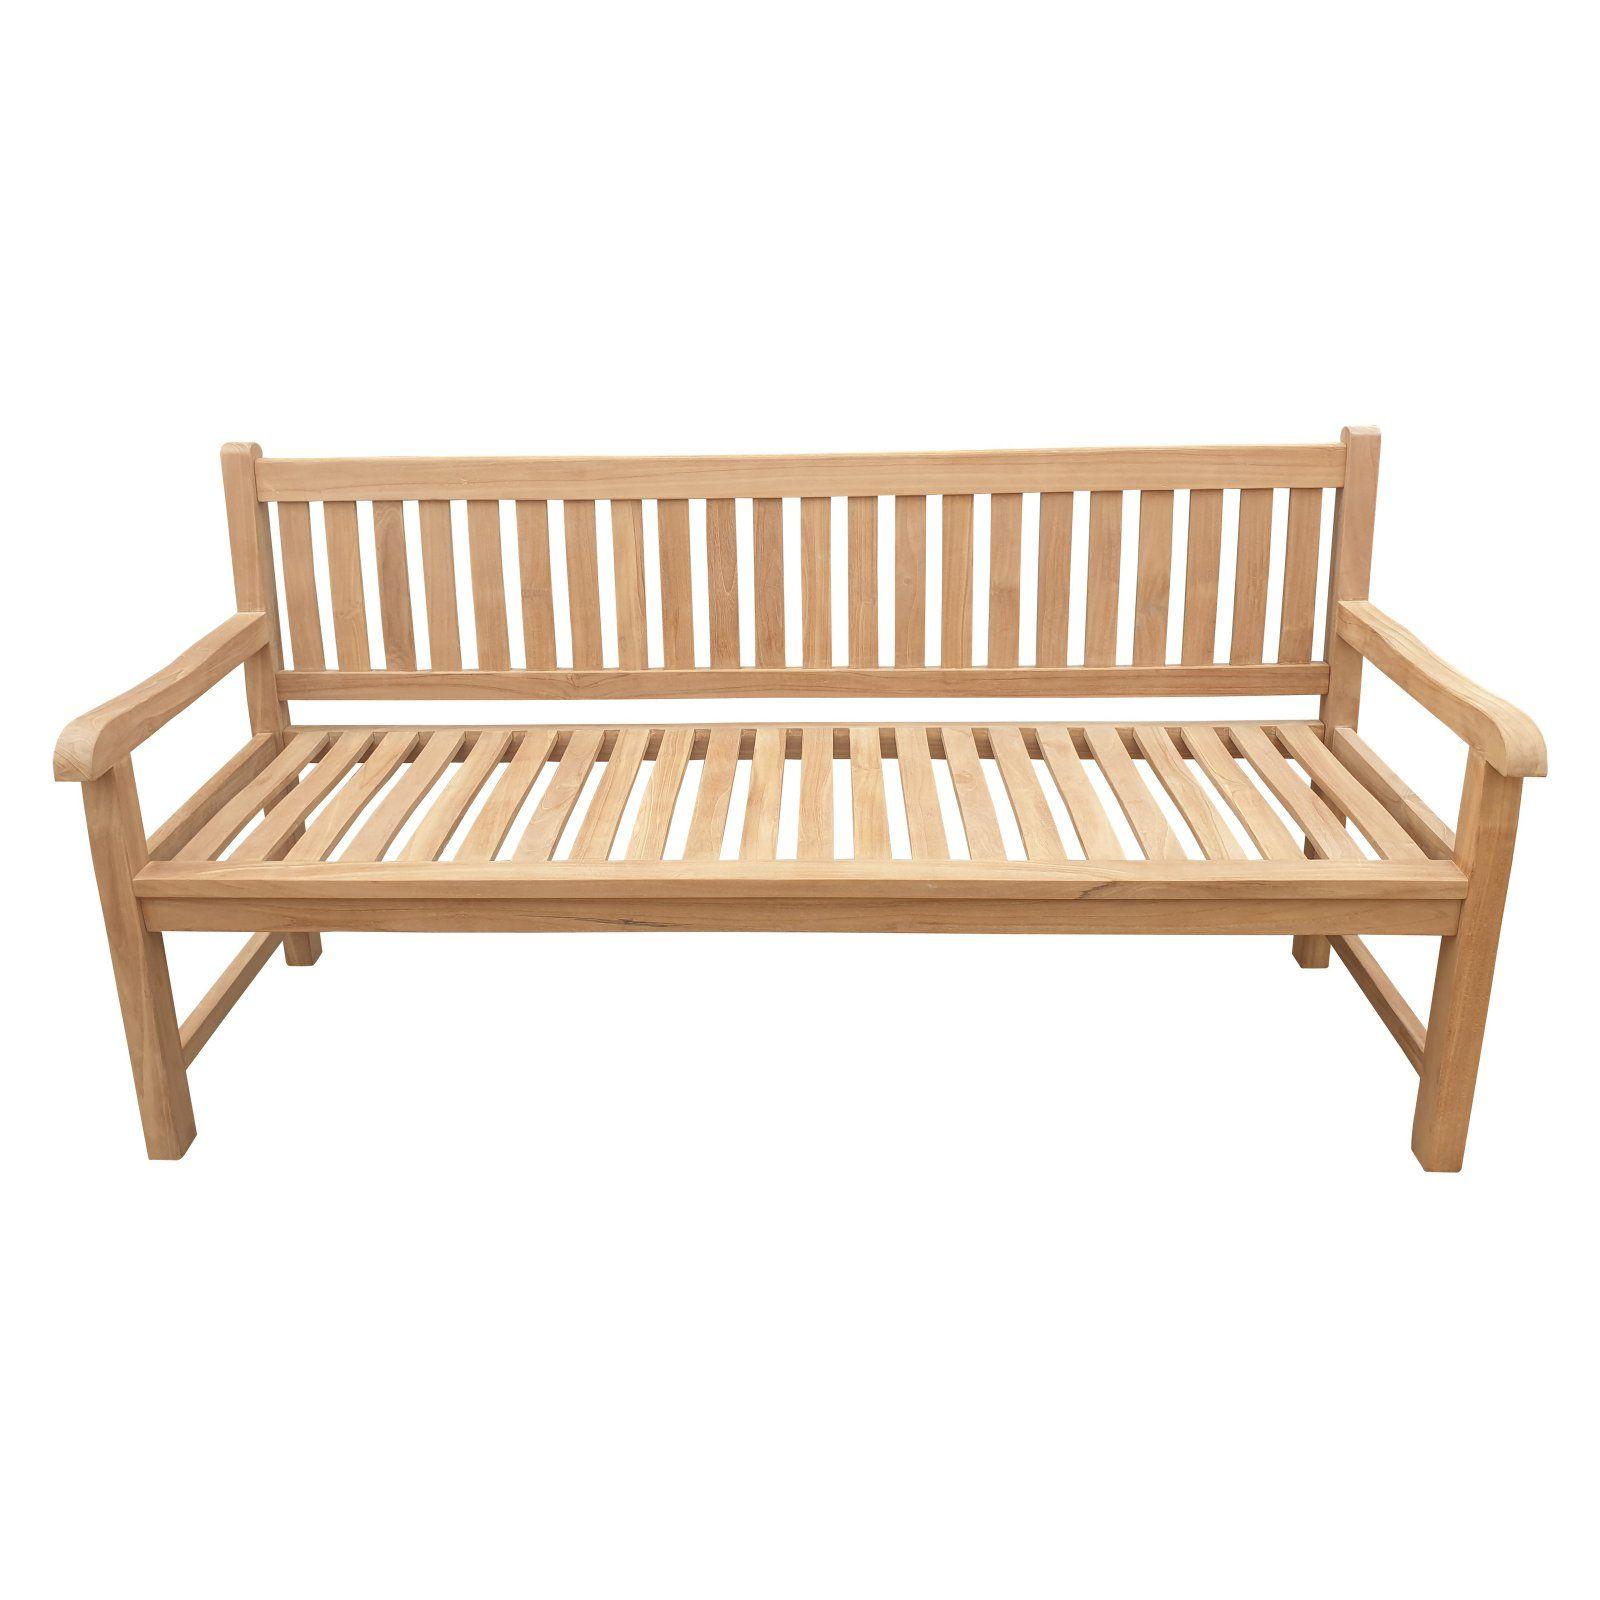 Miraculous Seven Seas Teak Santiago Outdoor Teak Wood Bench Products Machost Co Dining Chair Design Ideas Machostcouk